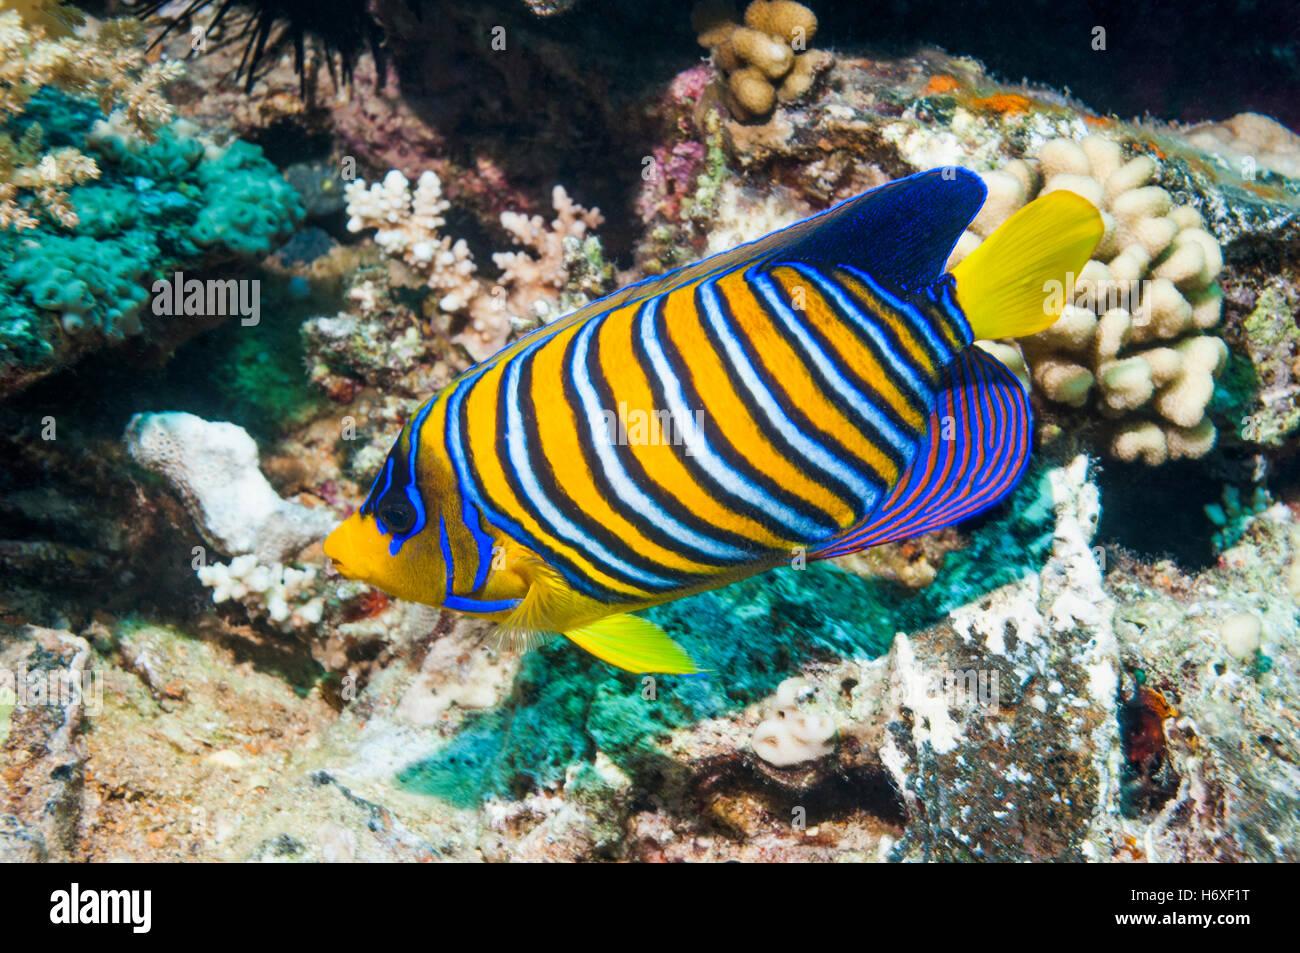 Regal angelfish [Pygoplites diacanthus].  Egypt, Red Sea. - Stock Image